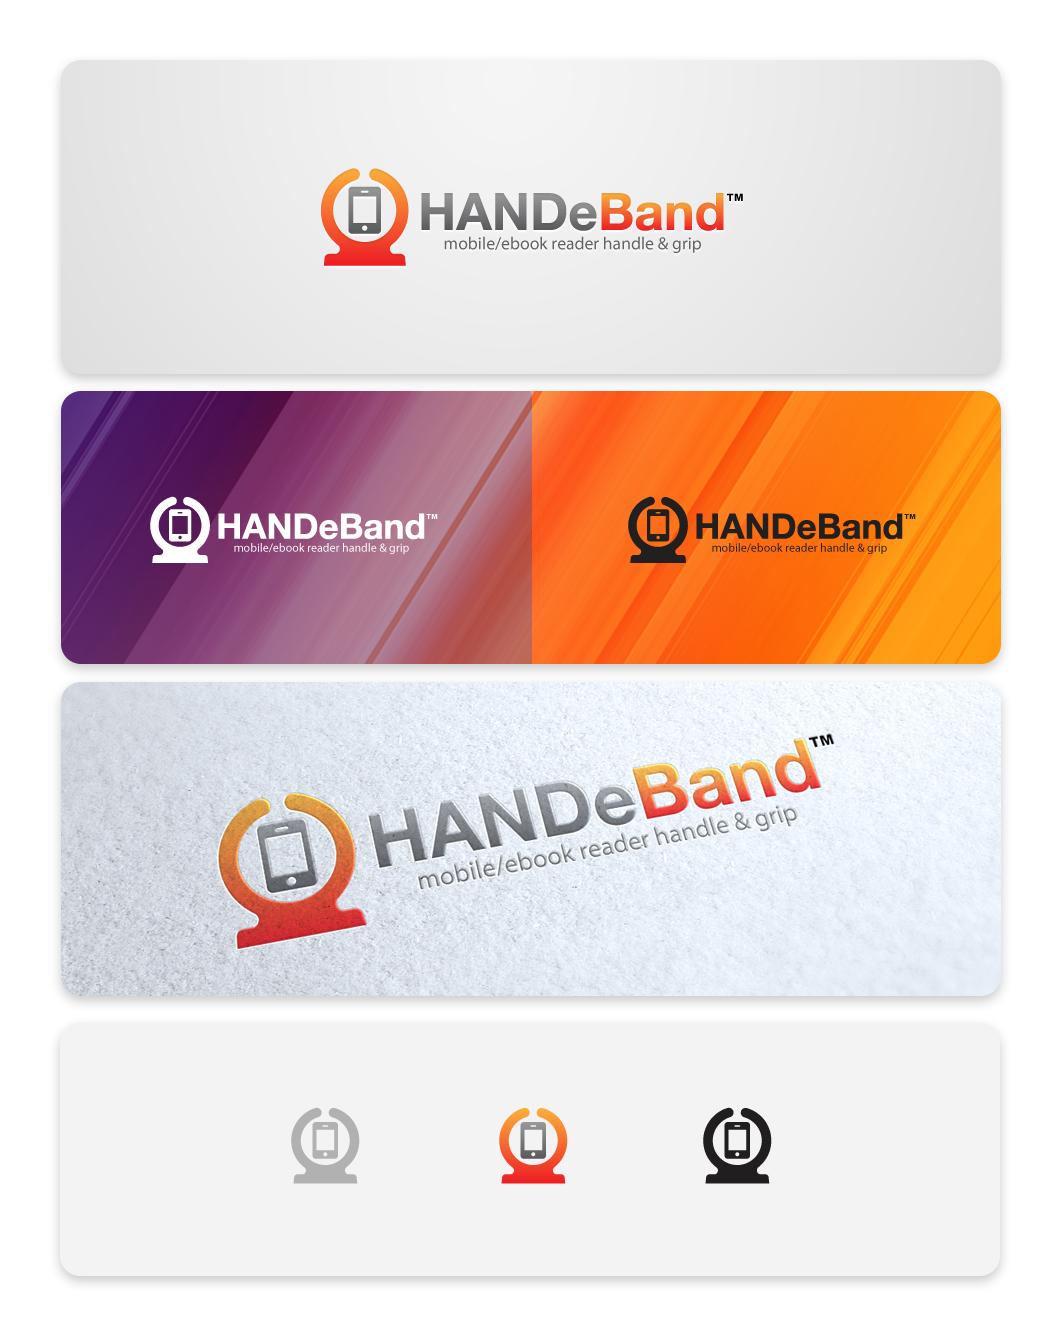 Create the next logo for HANDeBand